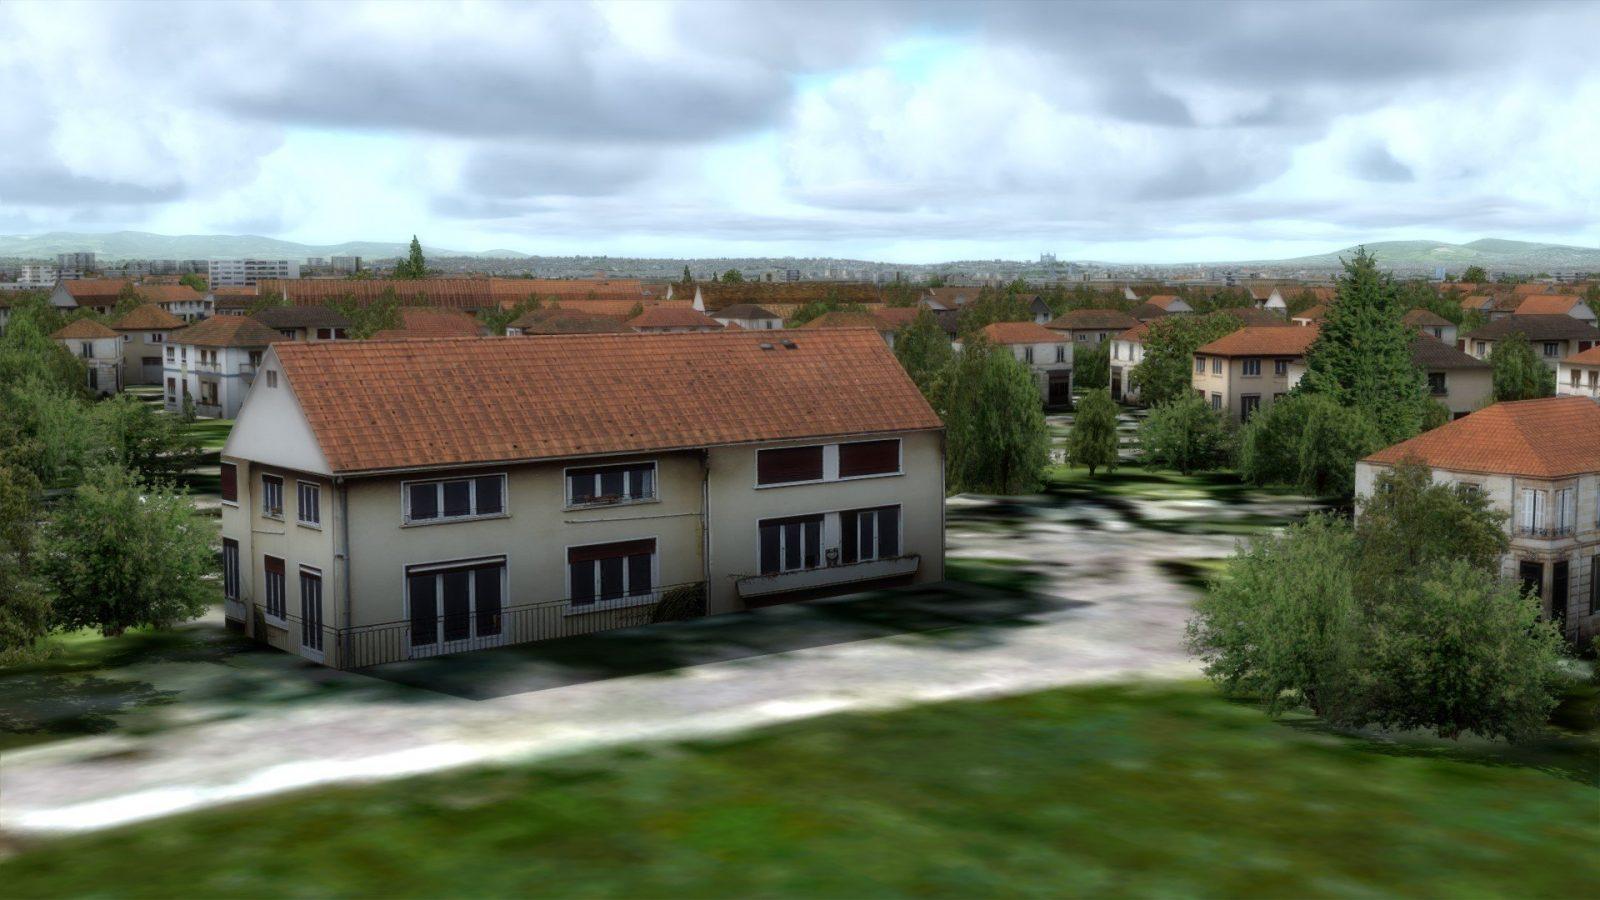 orbx-buildings-hd-previews-10-1600x900.j